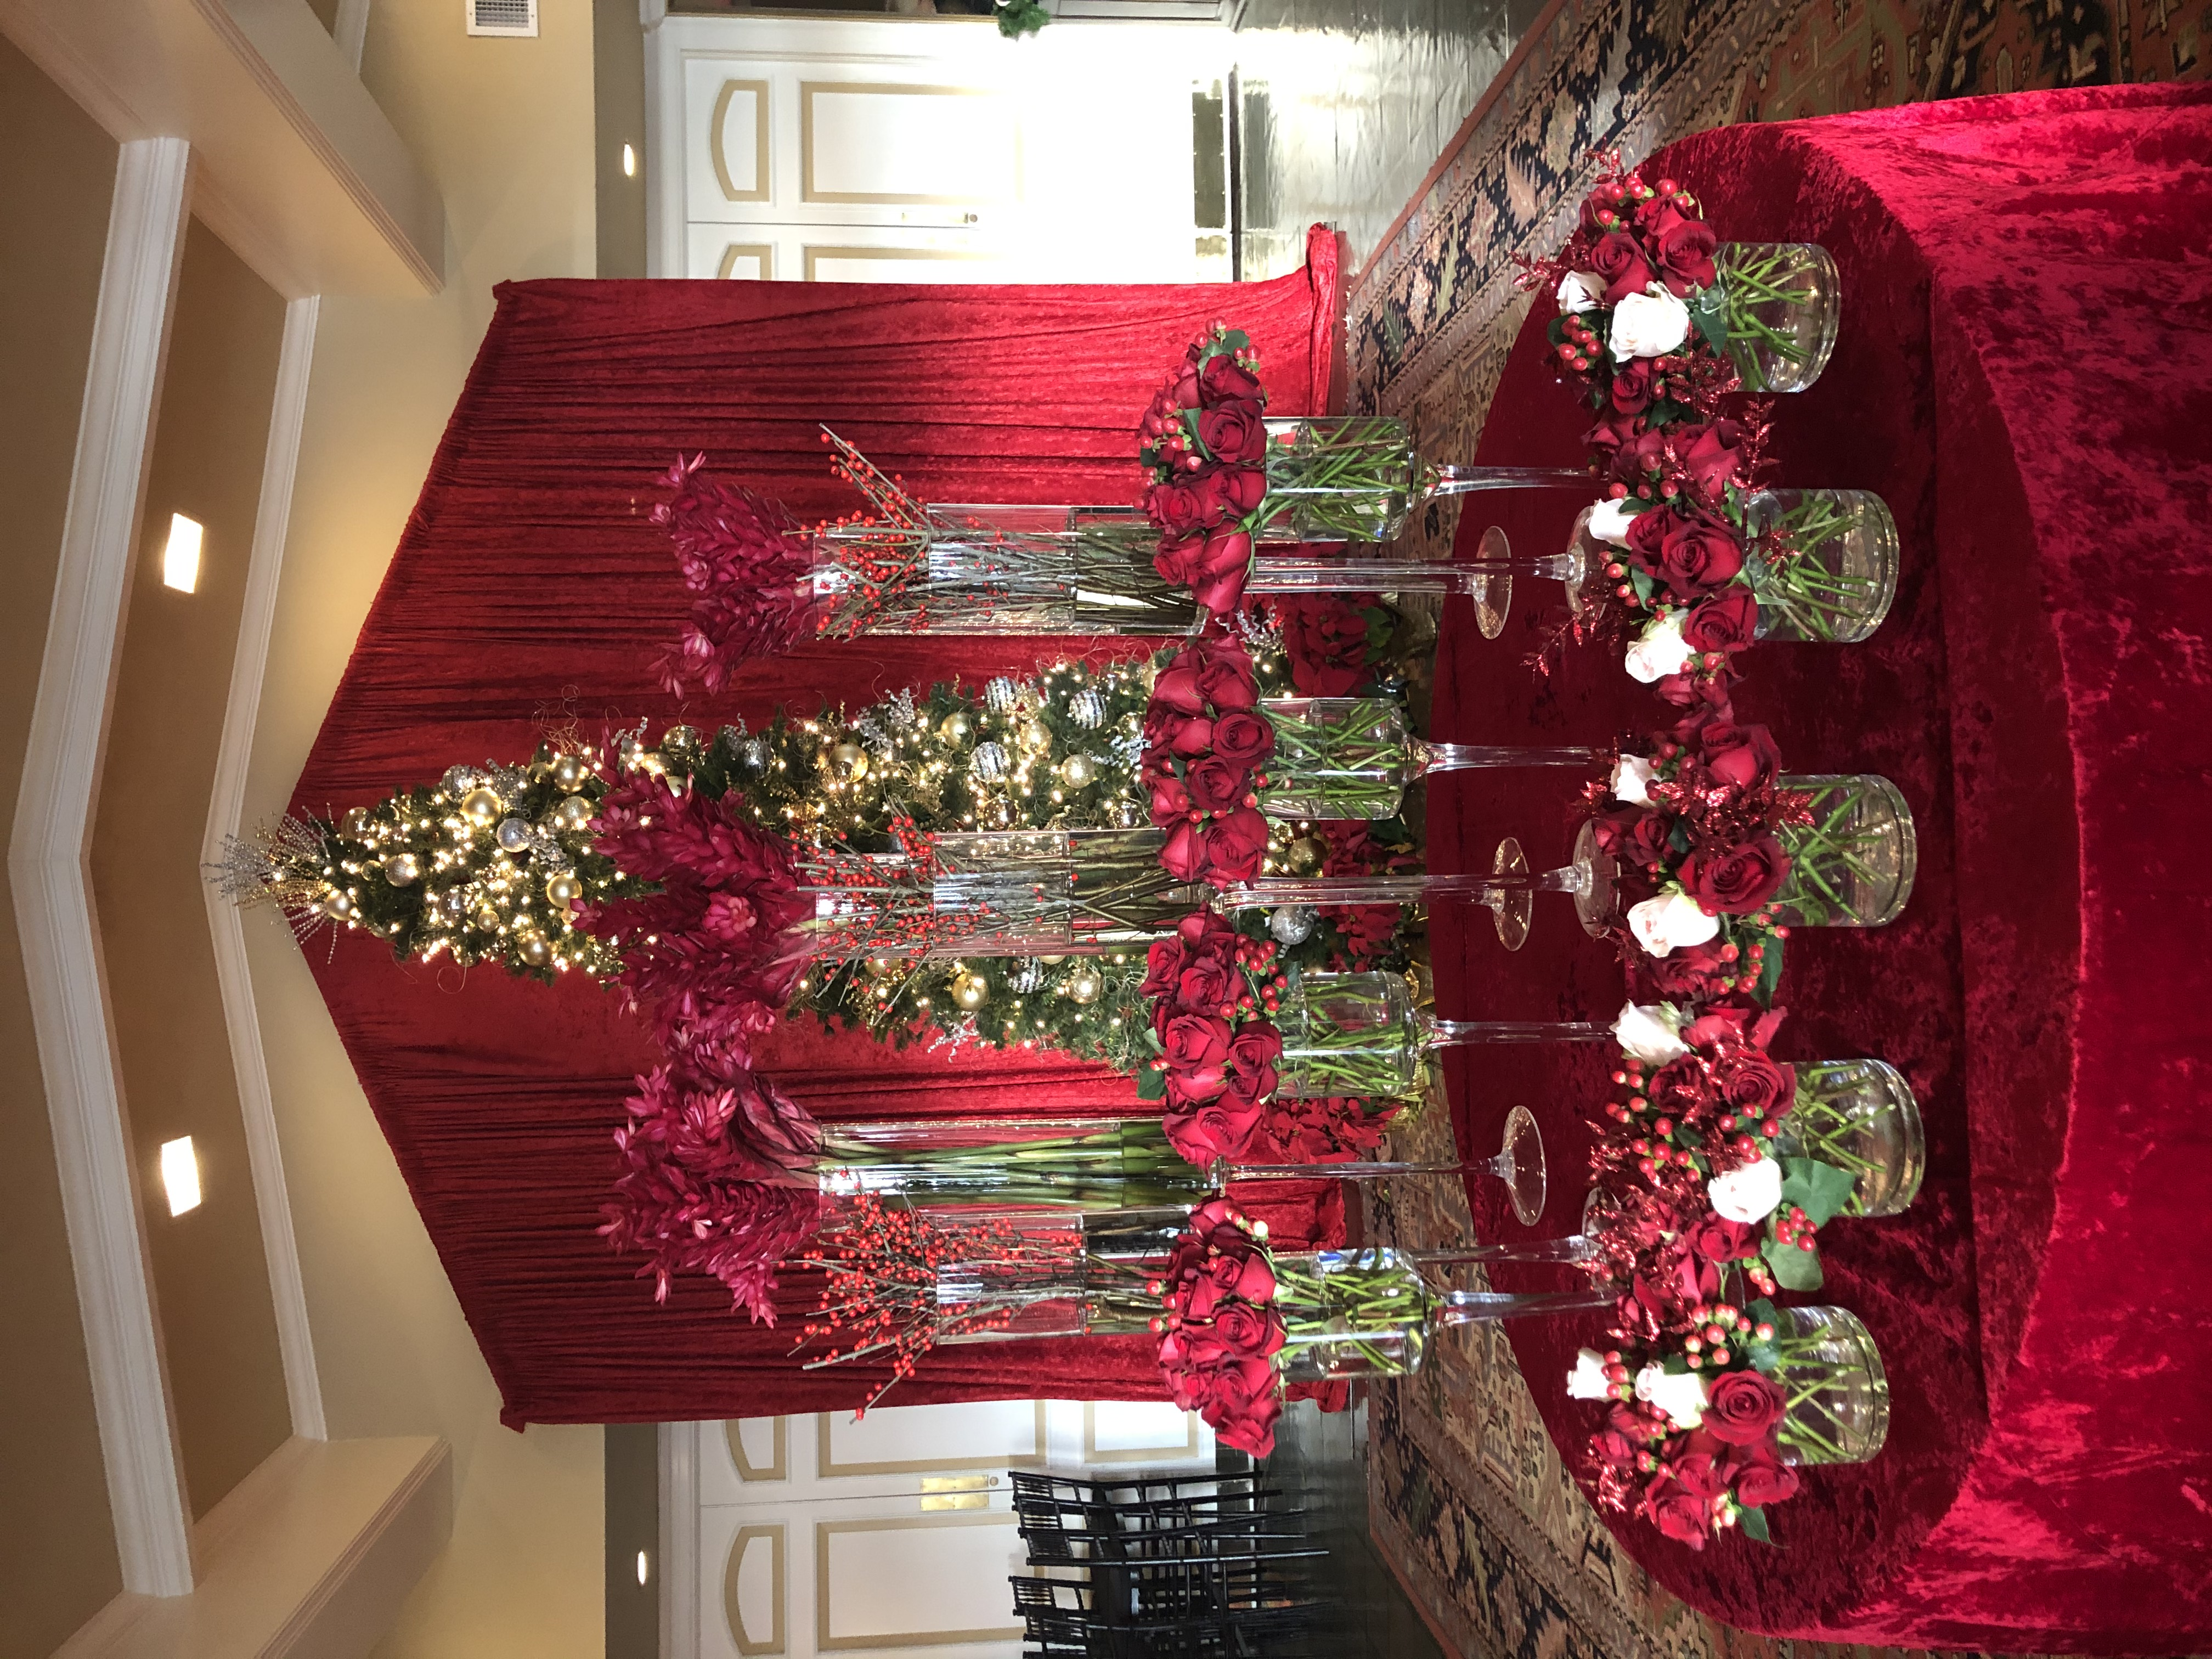 Country Club Black Tie Floral Entrance